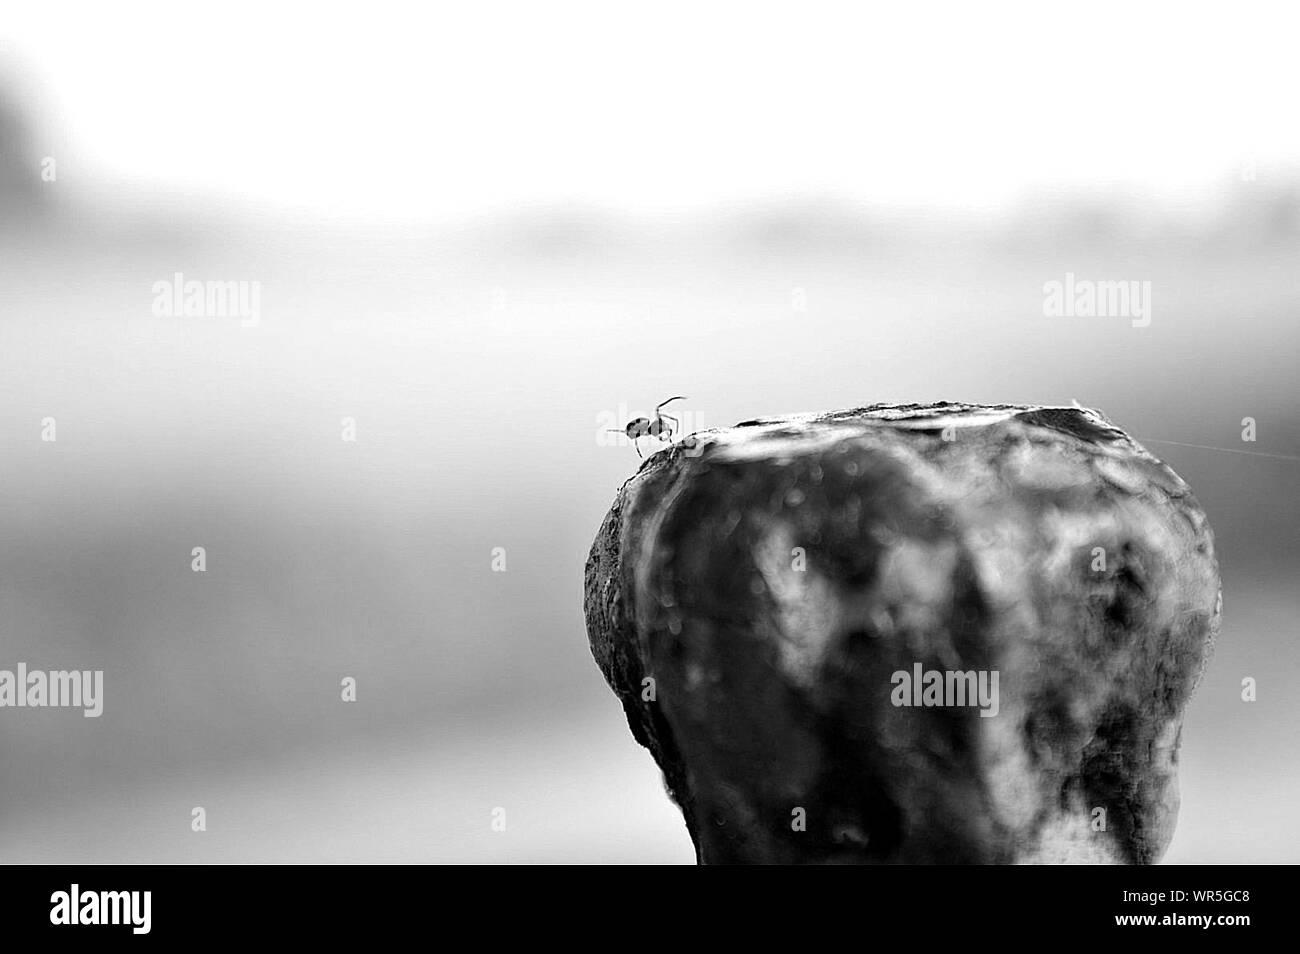 Macro Shot Of Ant Crawling On Rock Stock Photo